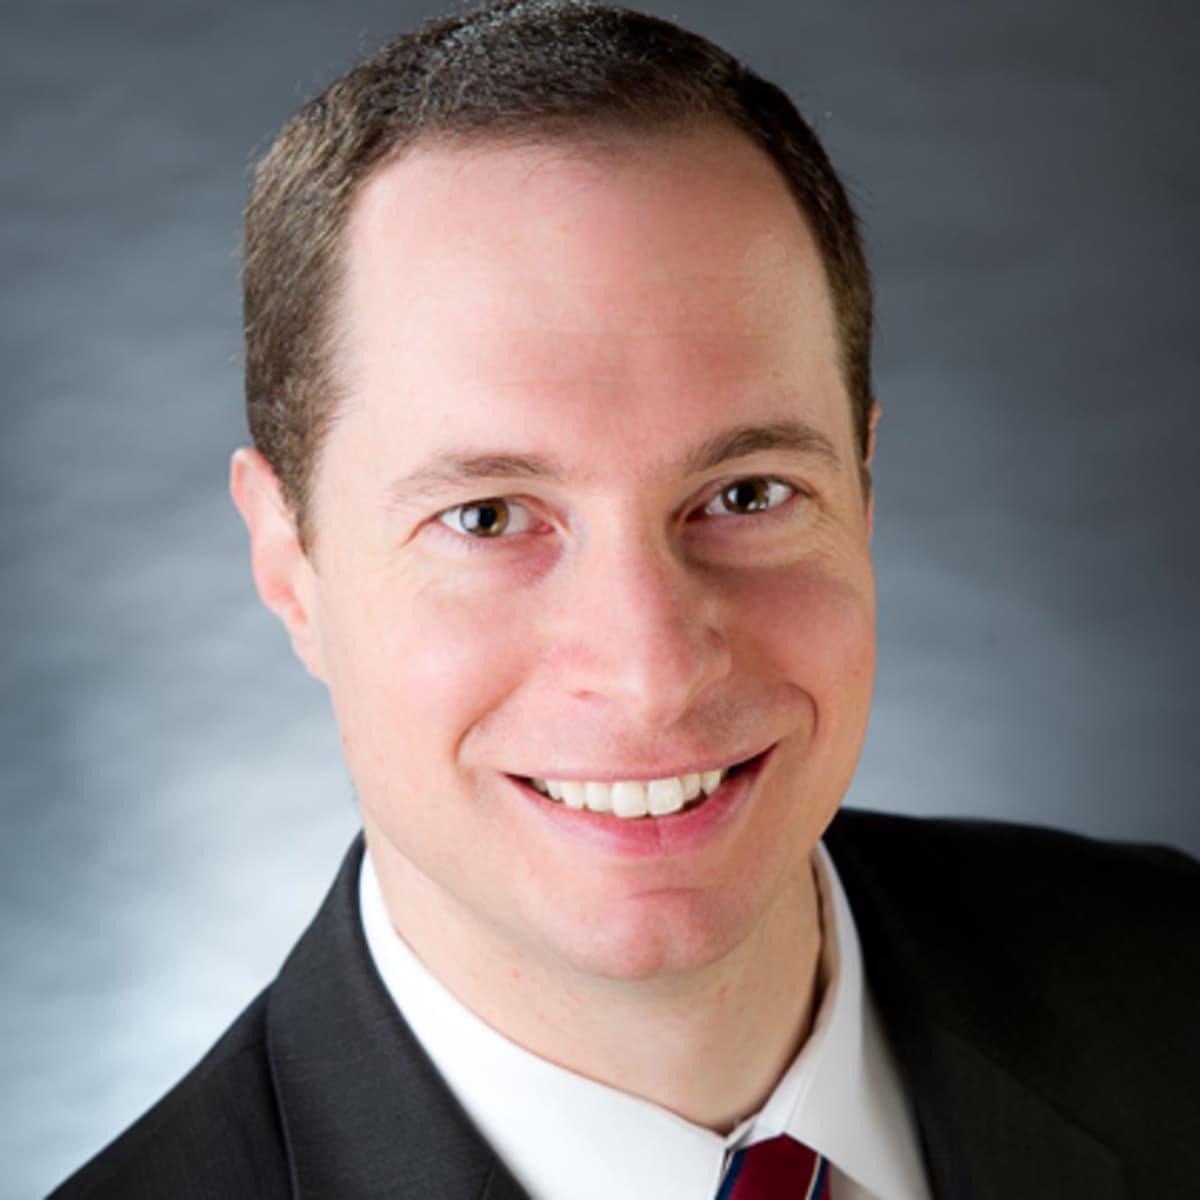 Credentials Dr Christopher Visco Md New York Ny Sports Medicine Doctor